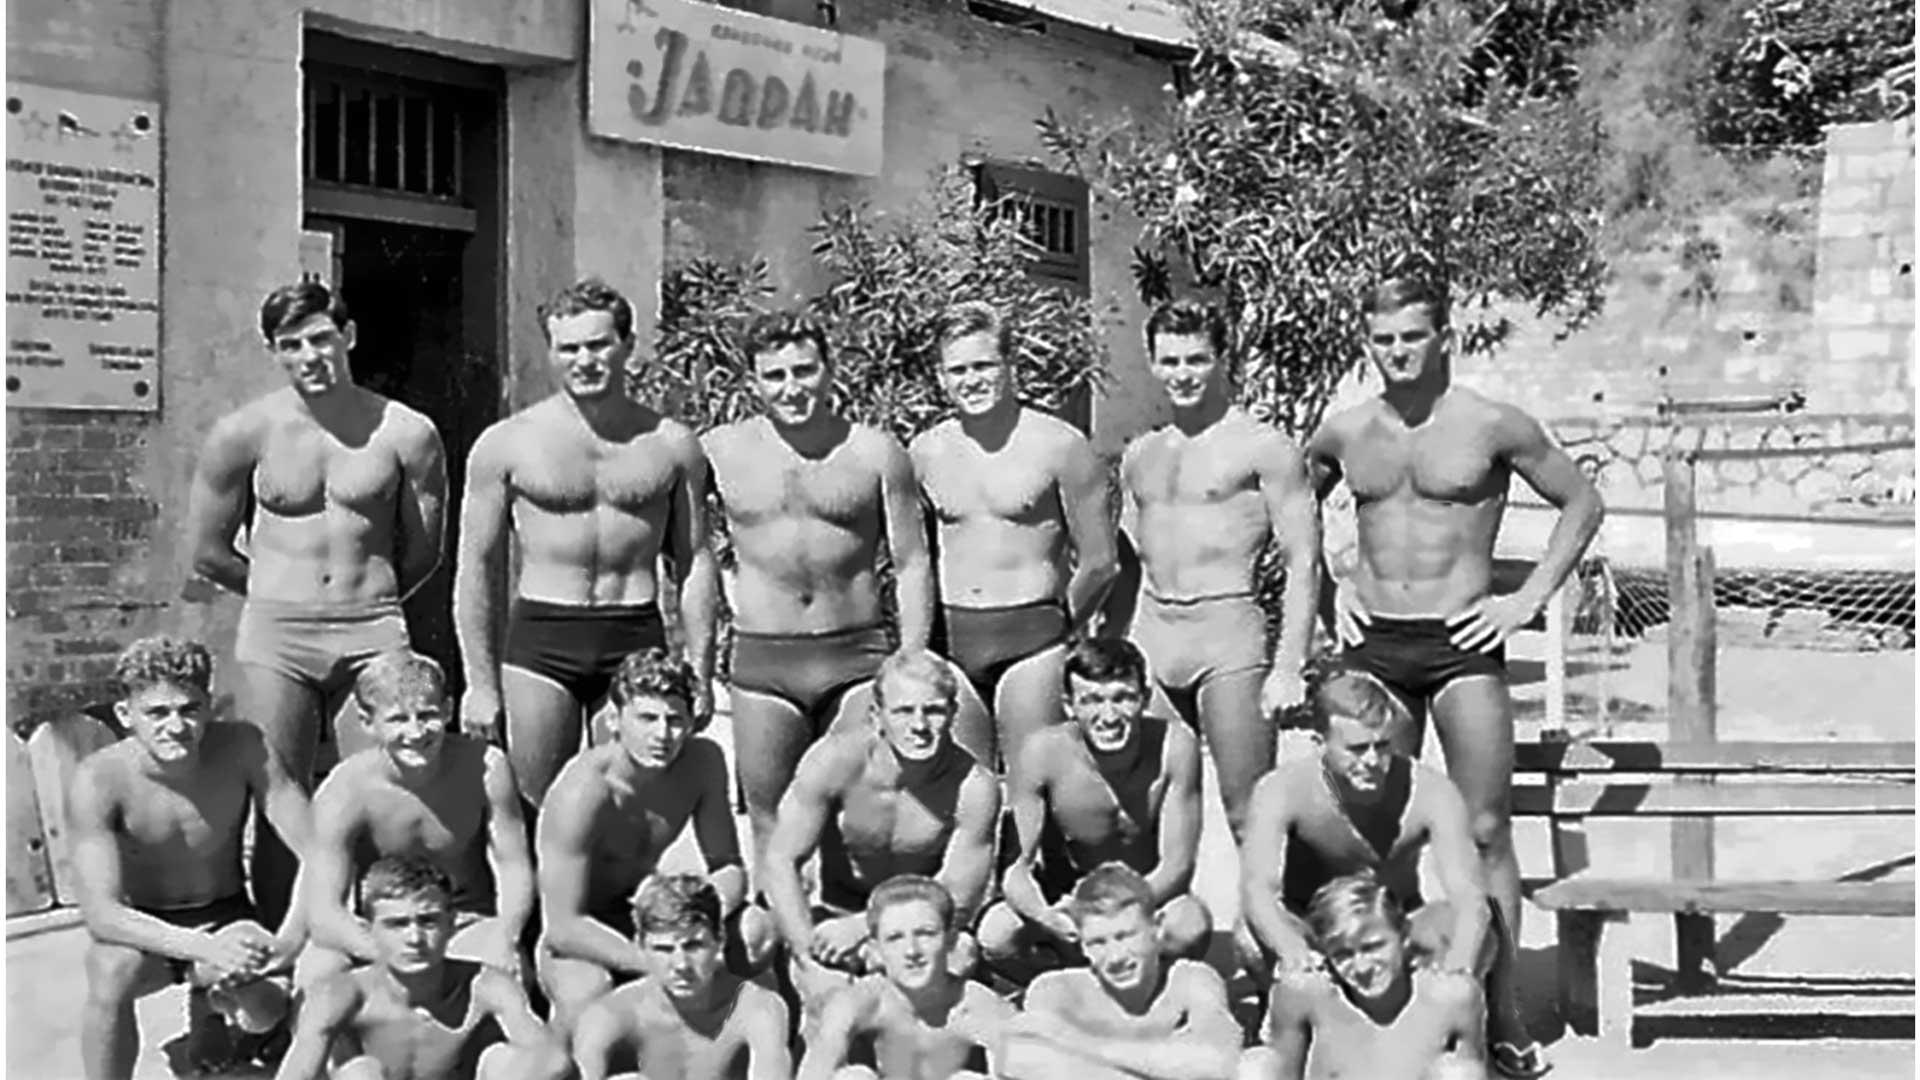 jadran-herceg-novi-prva-titula-1958